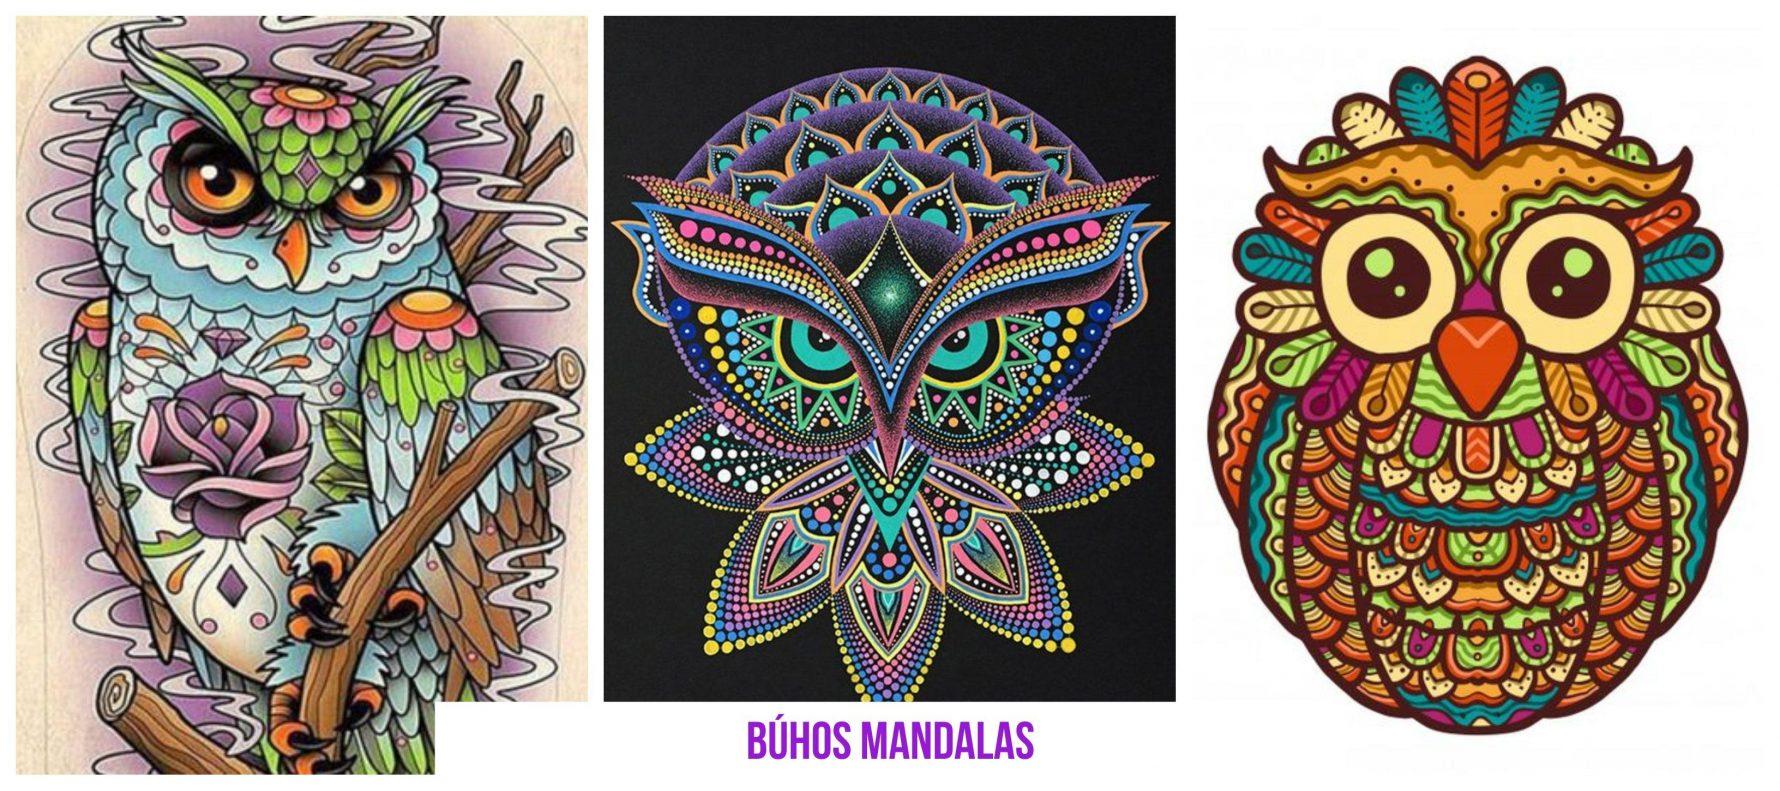 Dibujos de búhos mandalas originales